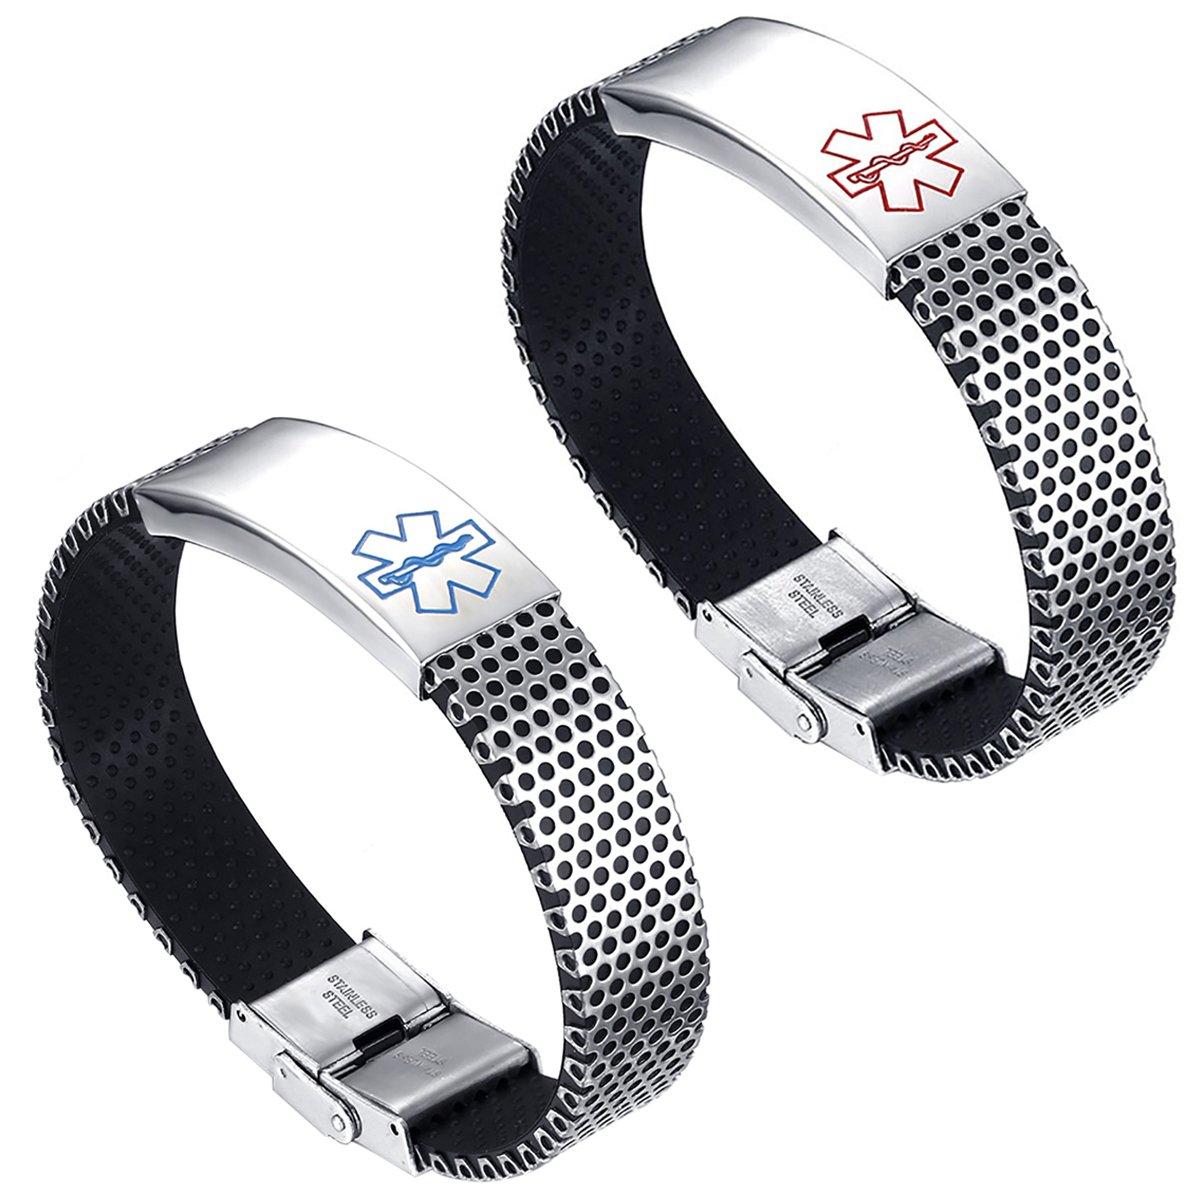 Flongo Custom Engraved Stainless Steel Lovely Medical Alert Bracelet ID Tag Wristband Bangle, 7.87 inch F066004